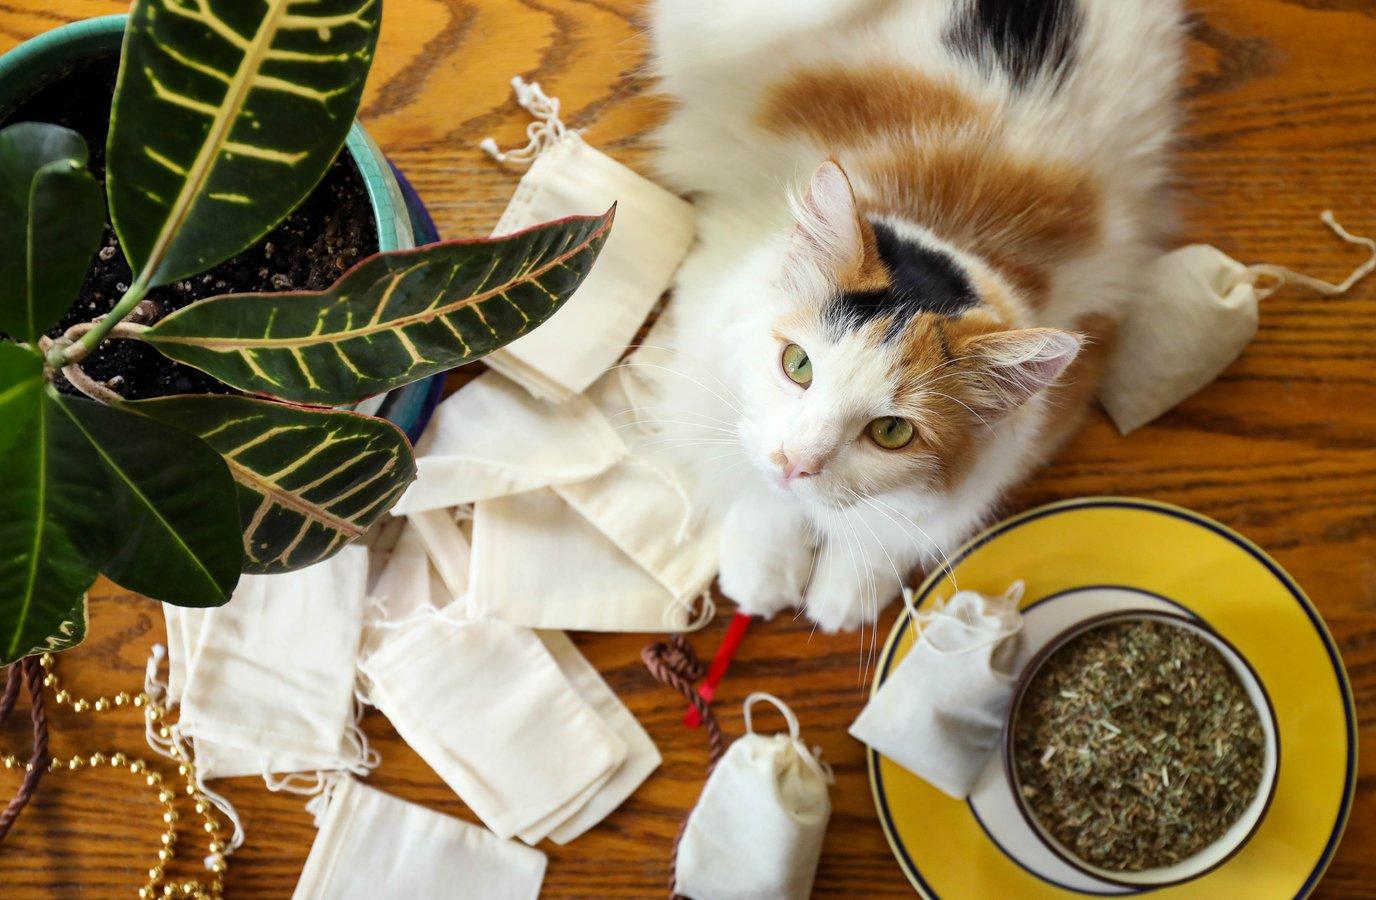 Beautiful calico cat with muslin bags and bulk catnip ready to make catnip tea bag toys.